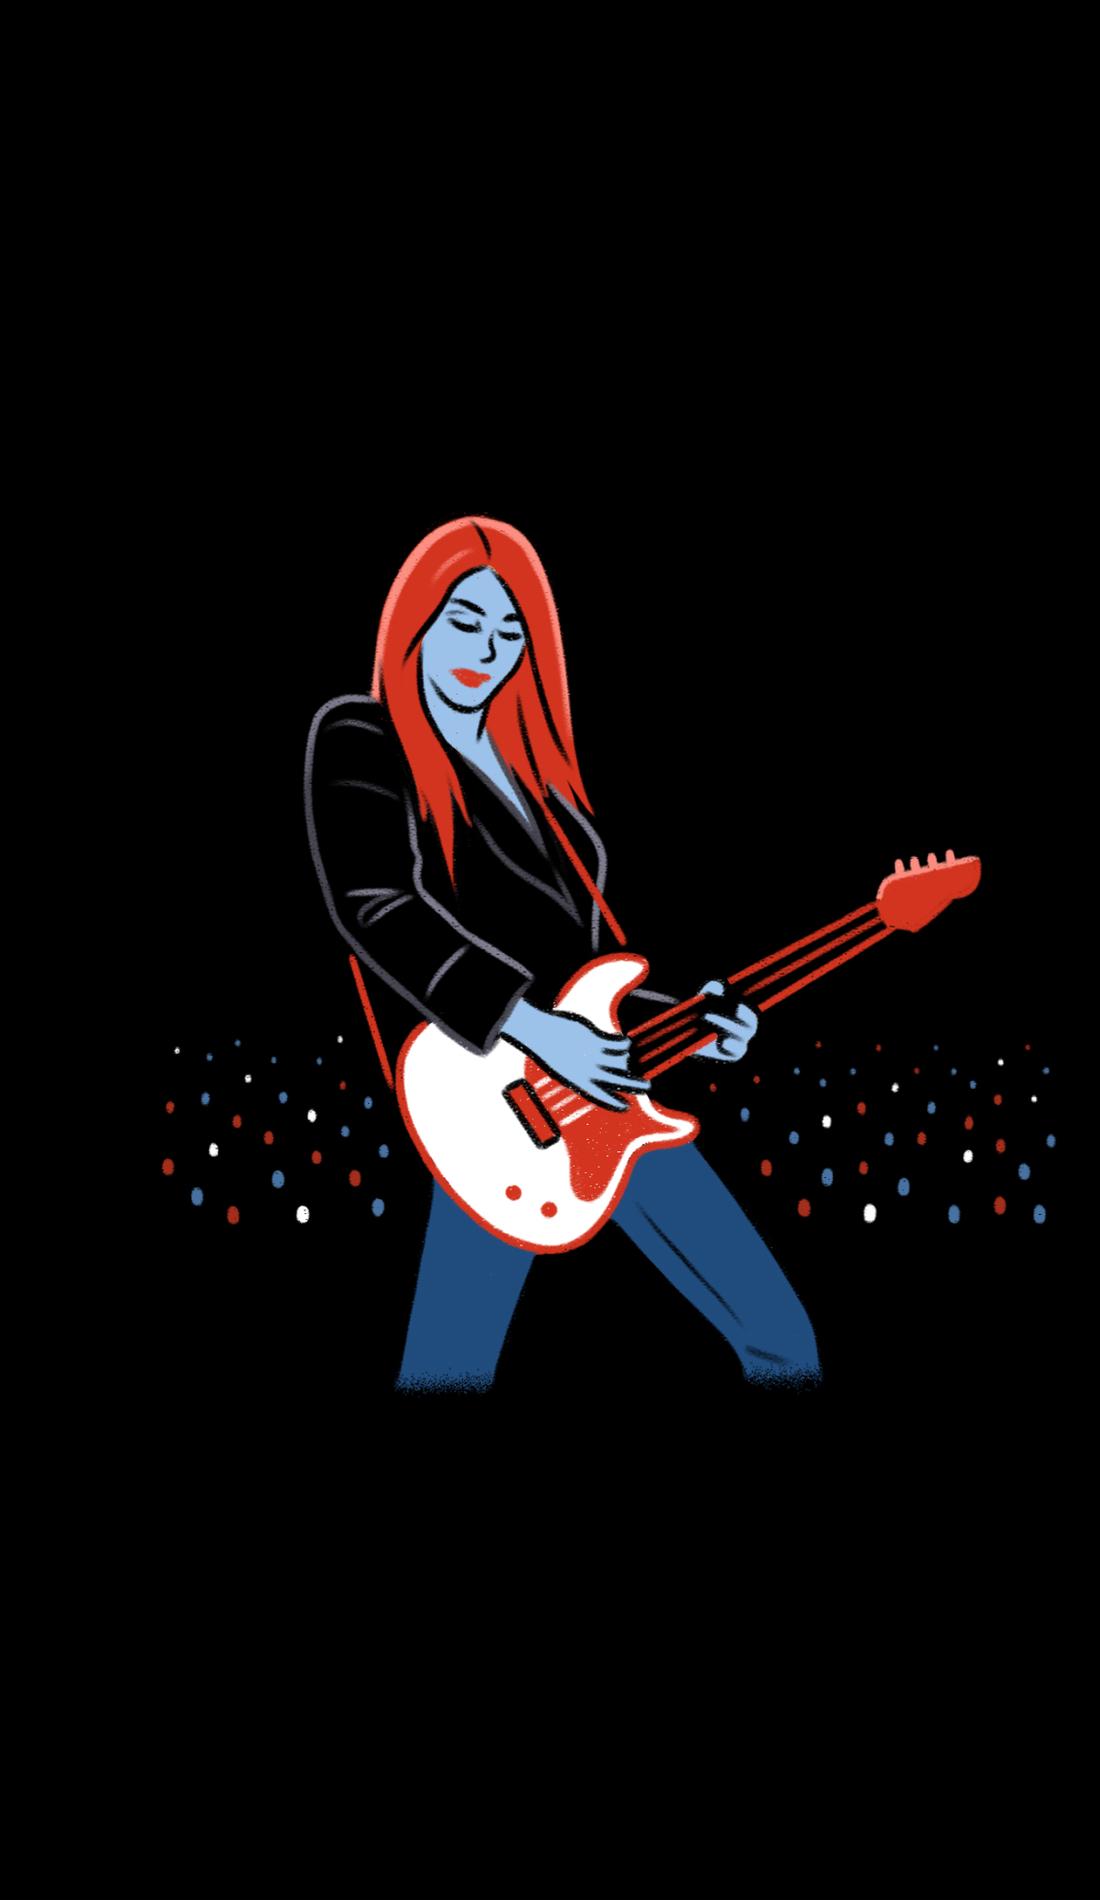 A Studio 54 live event